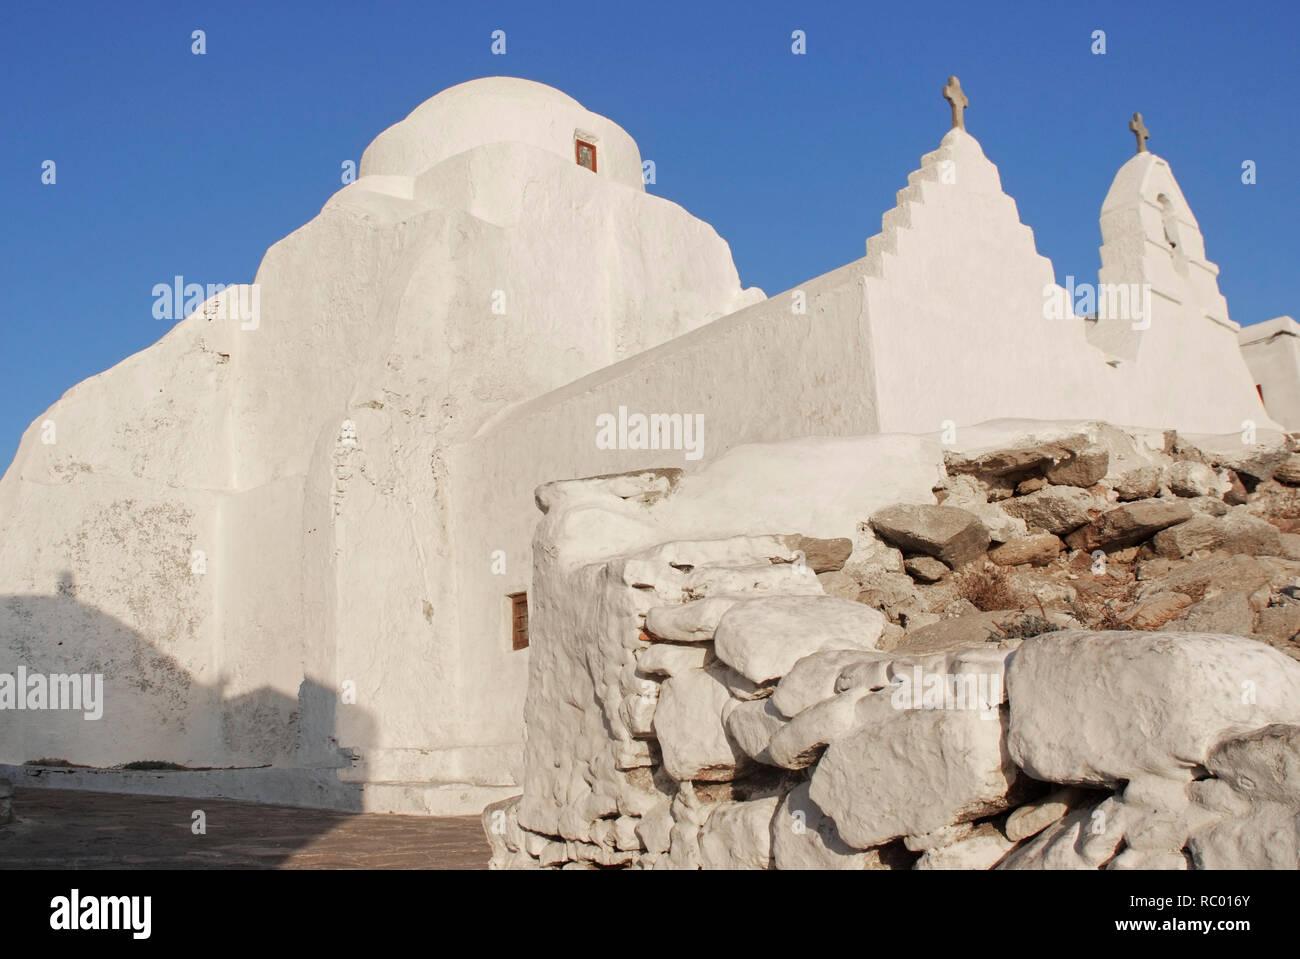 Panagia-Paraportiani Kirche in der Chora, Mykonos, Insel der Kykladen im Ägäischen Meer, Griechenland, Europa | The church of Panagia (Virgin Mary) Pa - Stock Image